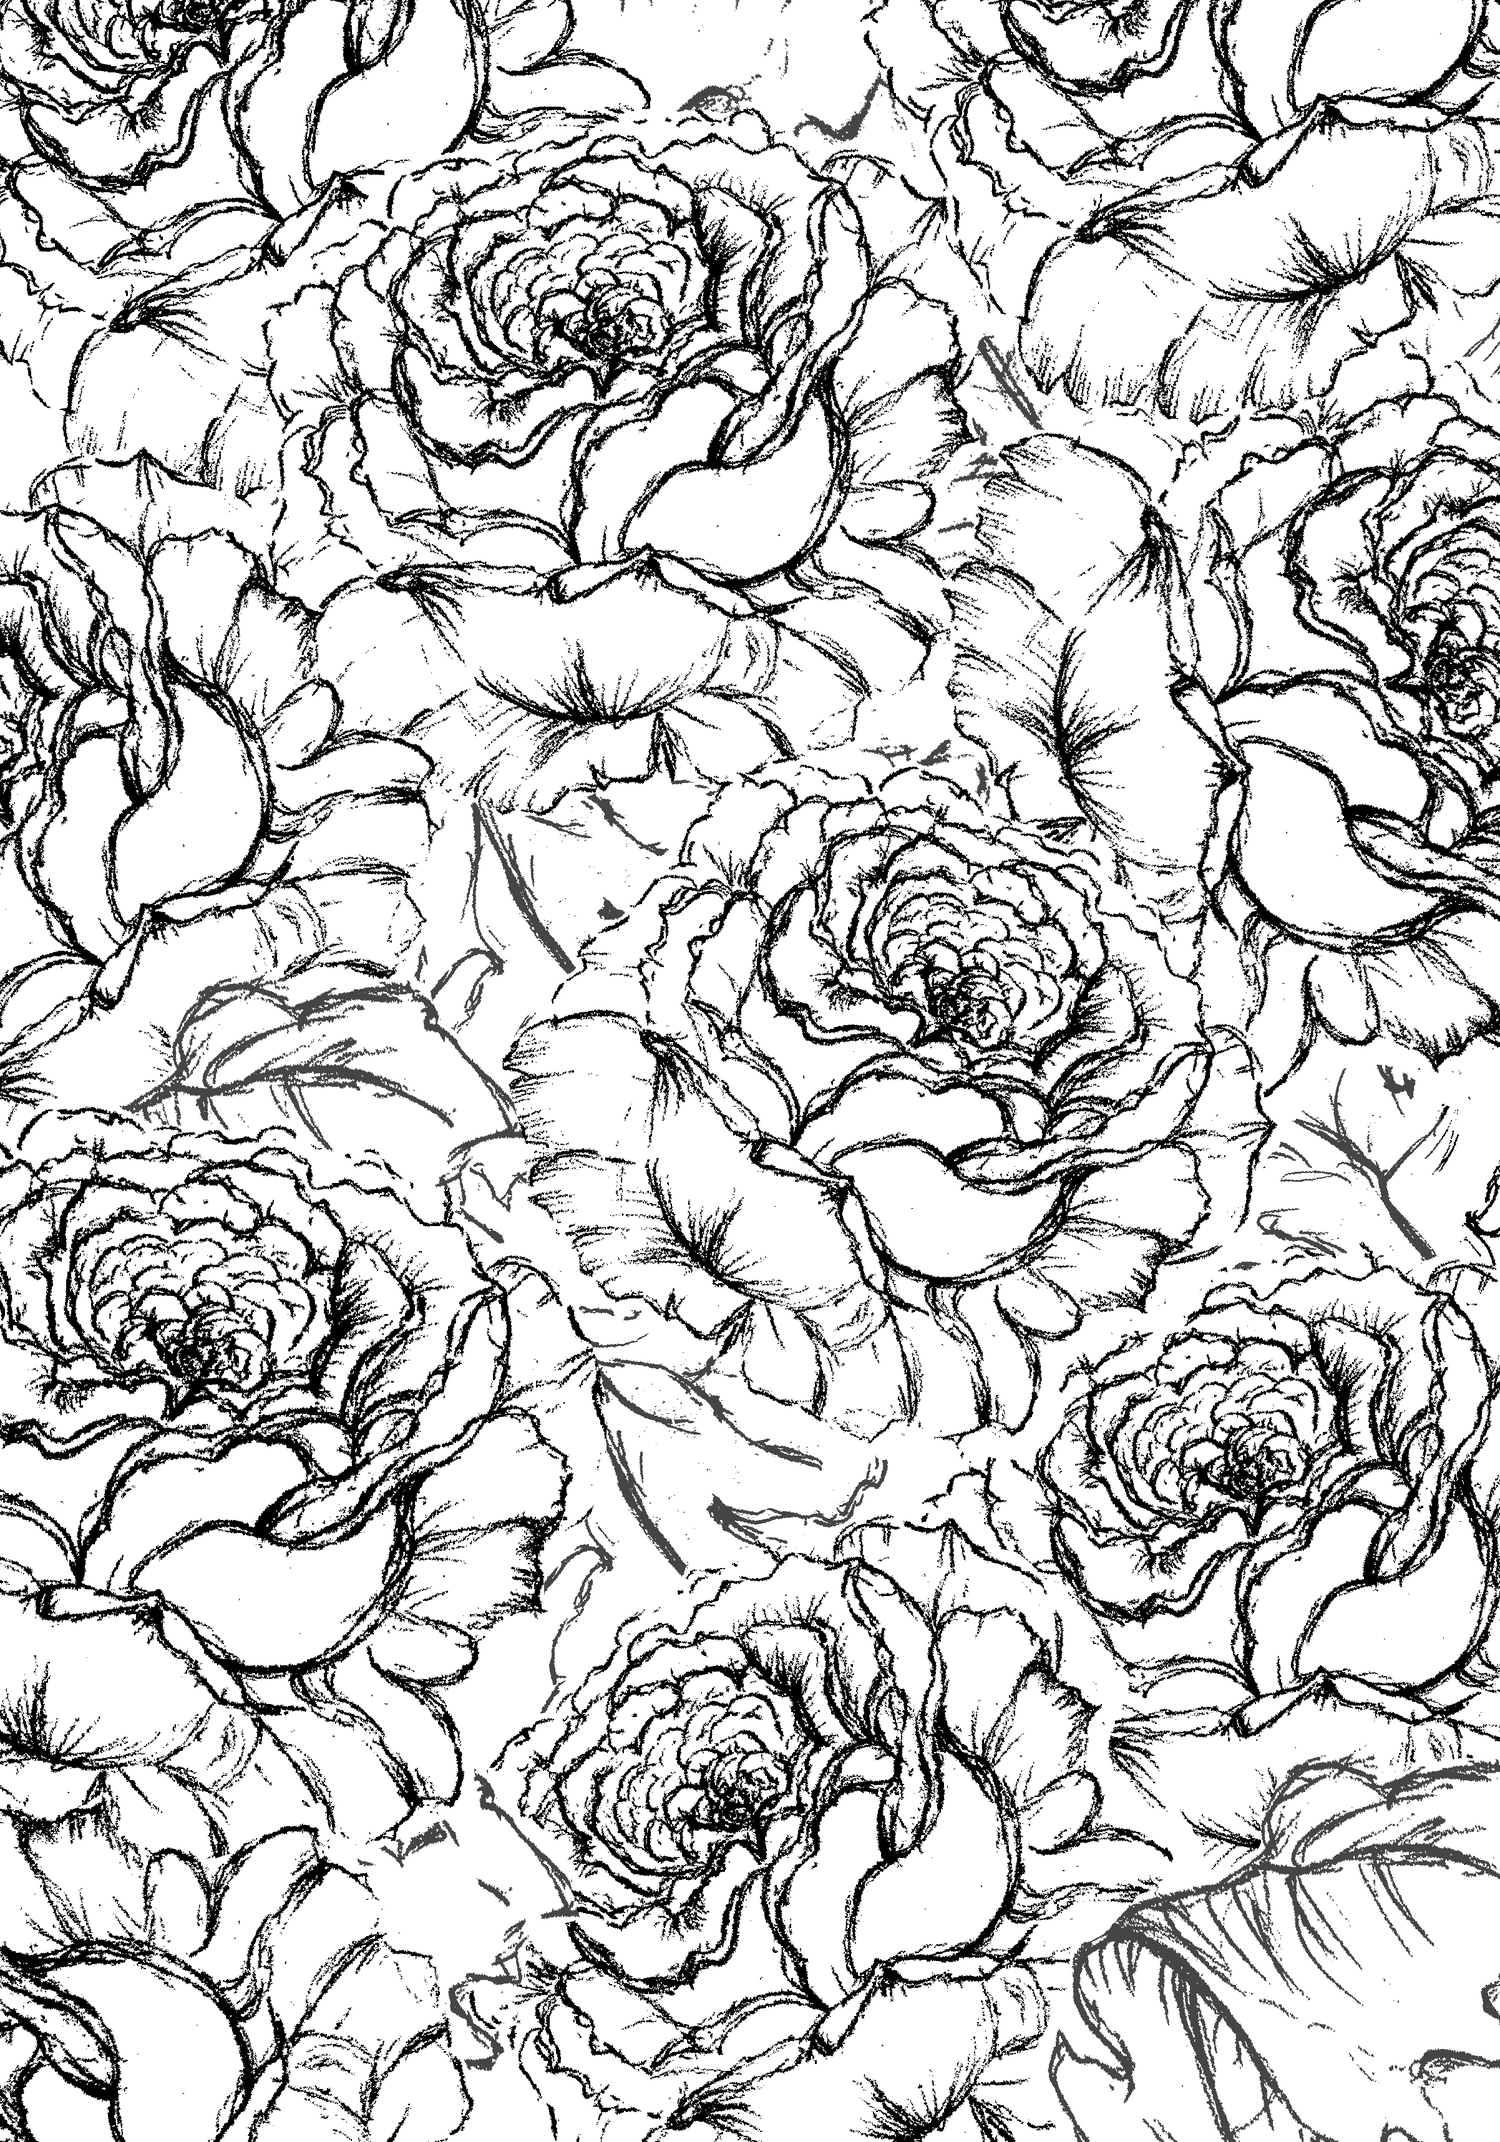 LINED_FLOWERS.JPG